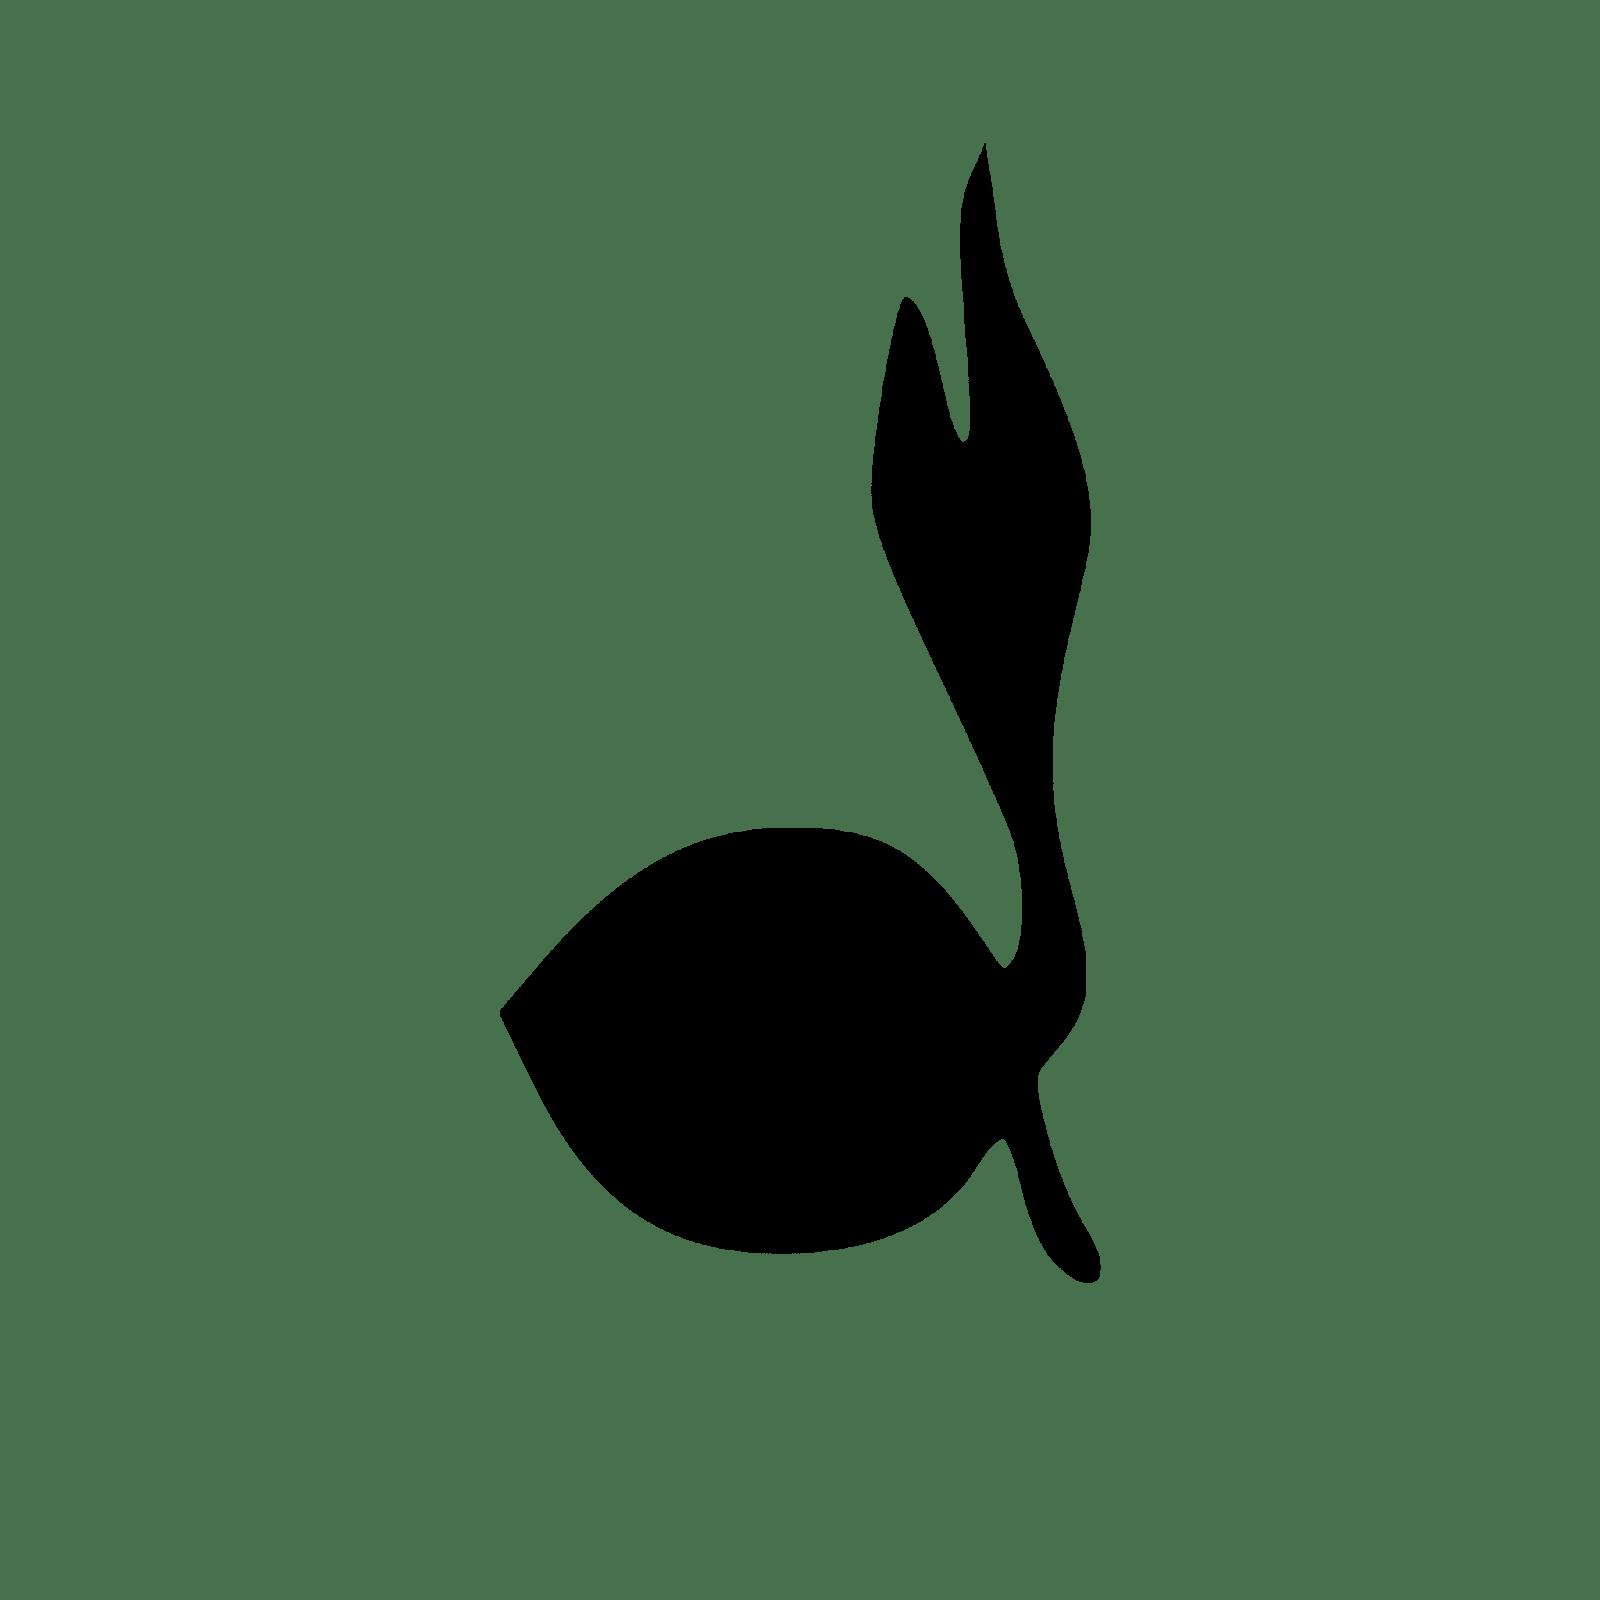 Logo Cikal Pramuka Png